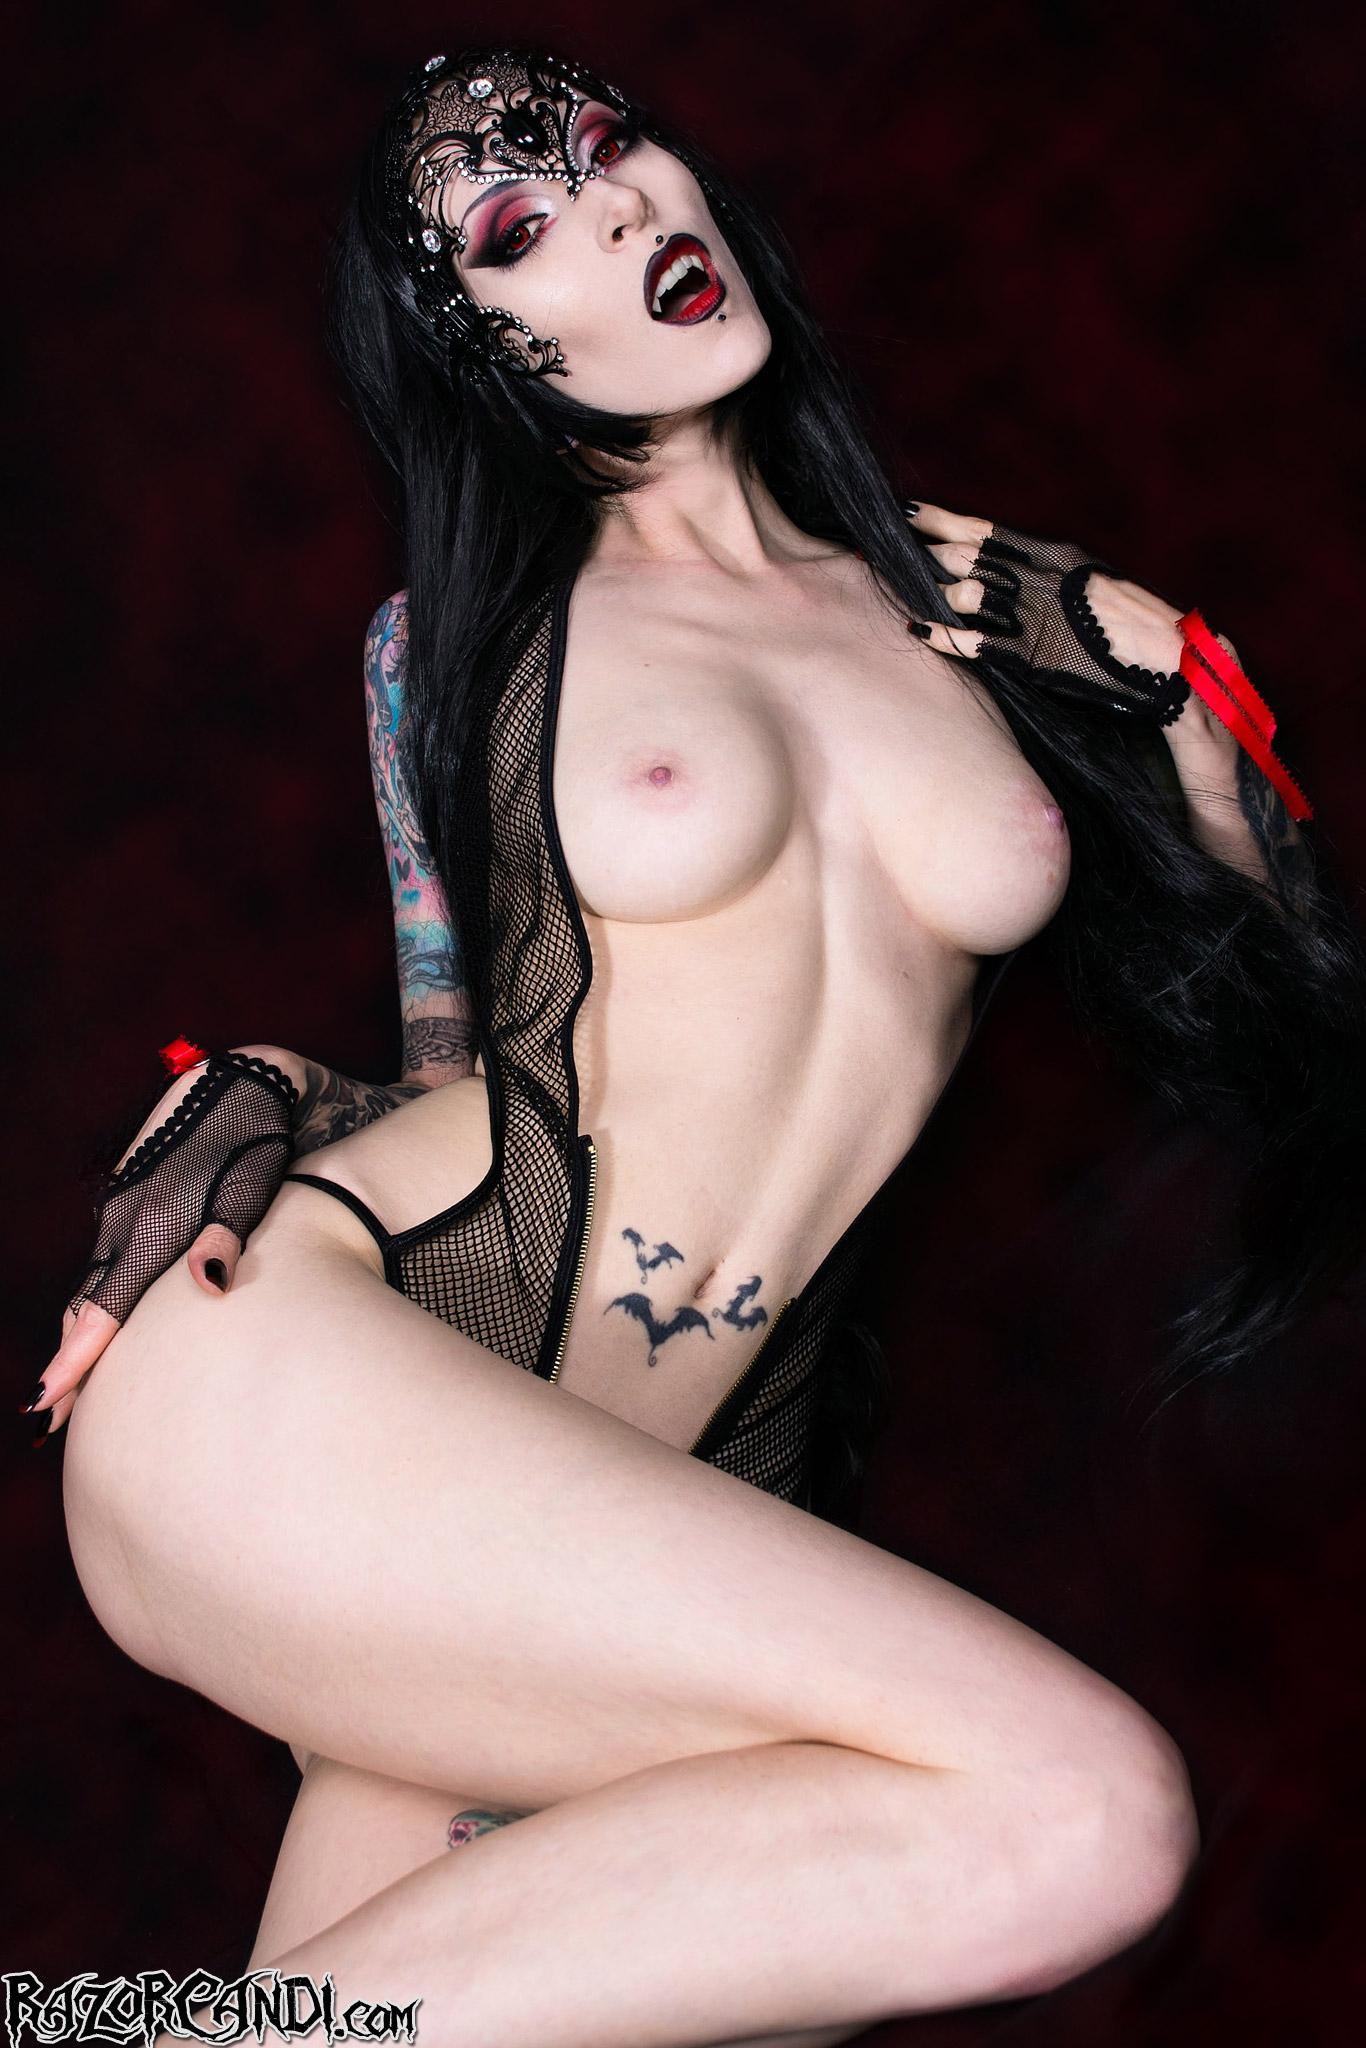 raven riley sex tape